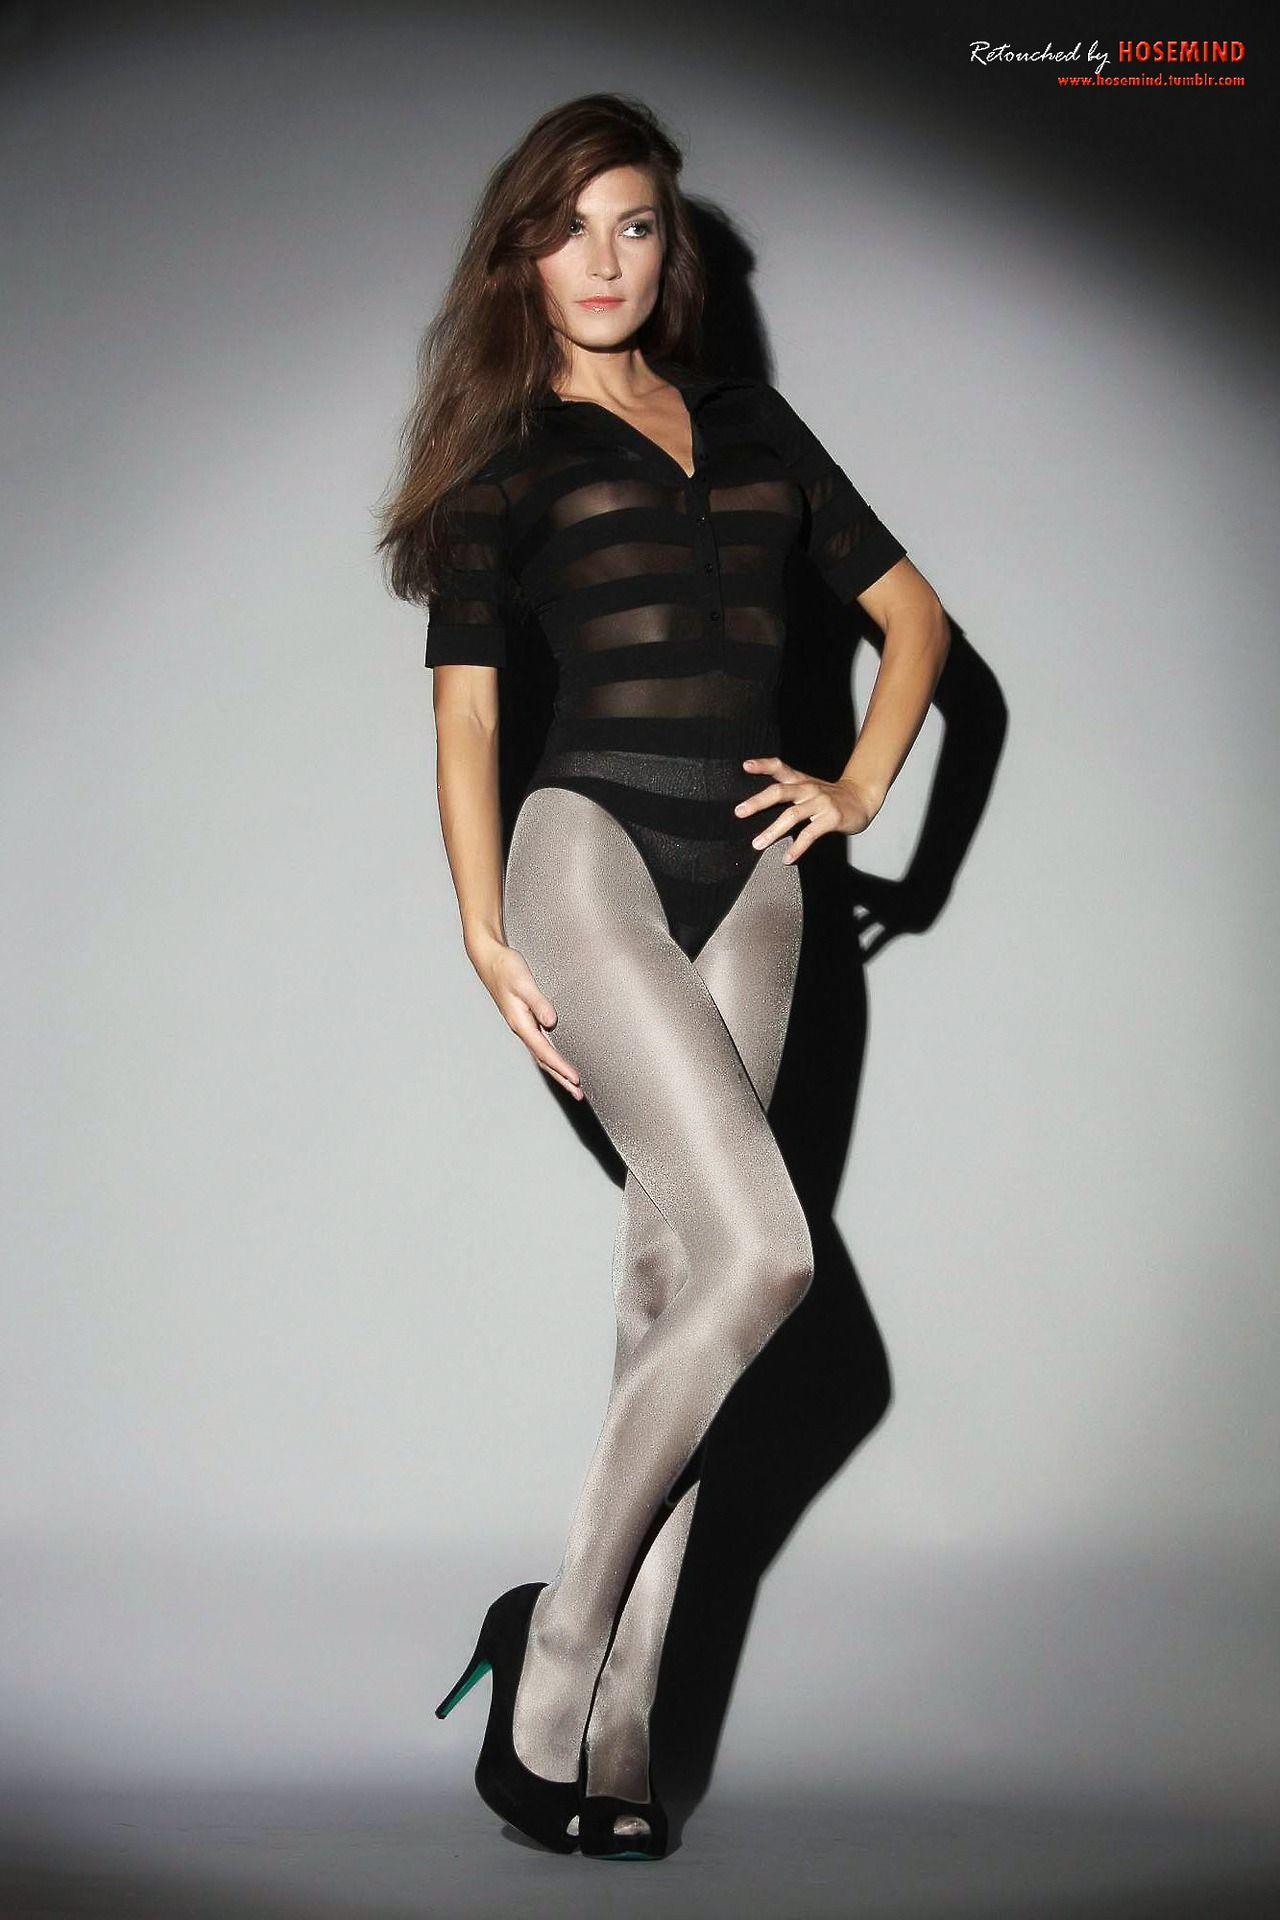 Silver shimmer pantyhose.   Nylon and sheer